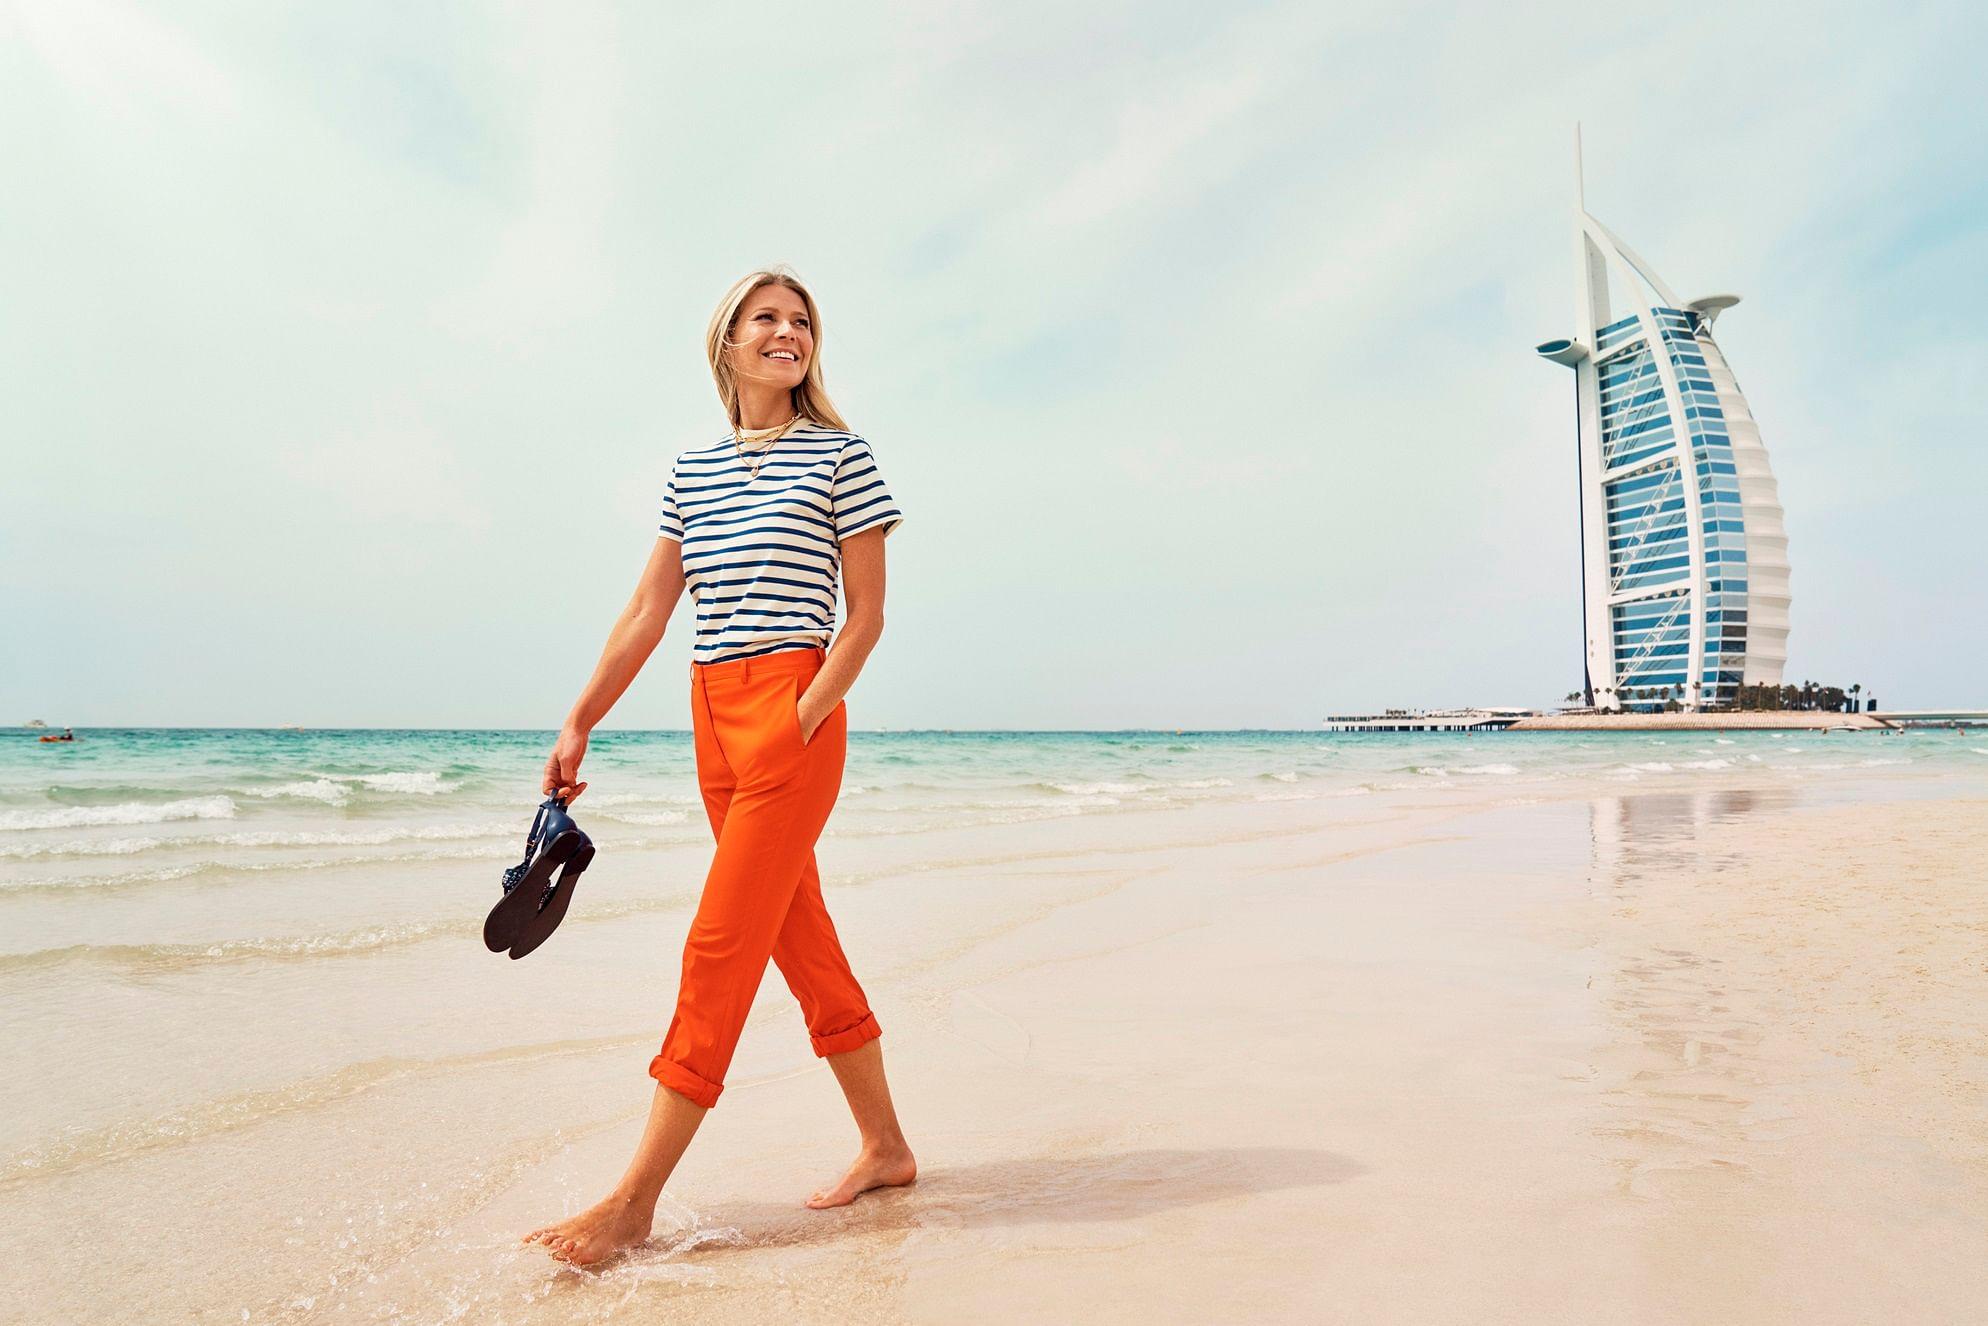 , Dubai through the eyes of stars, Top Breaking News